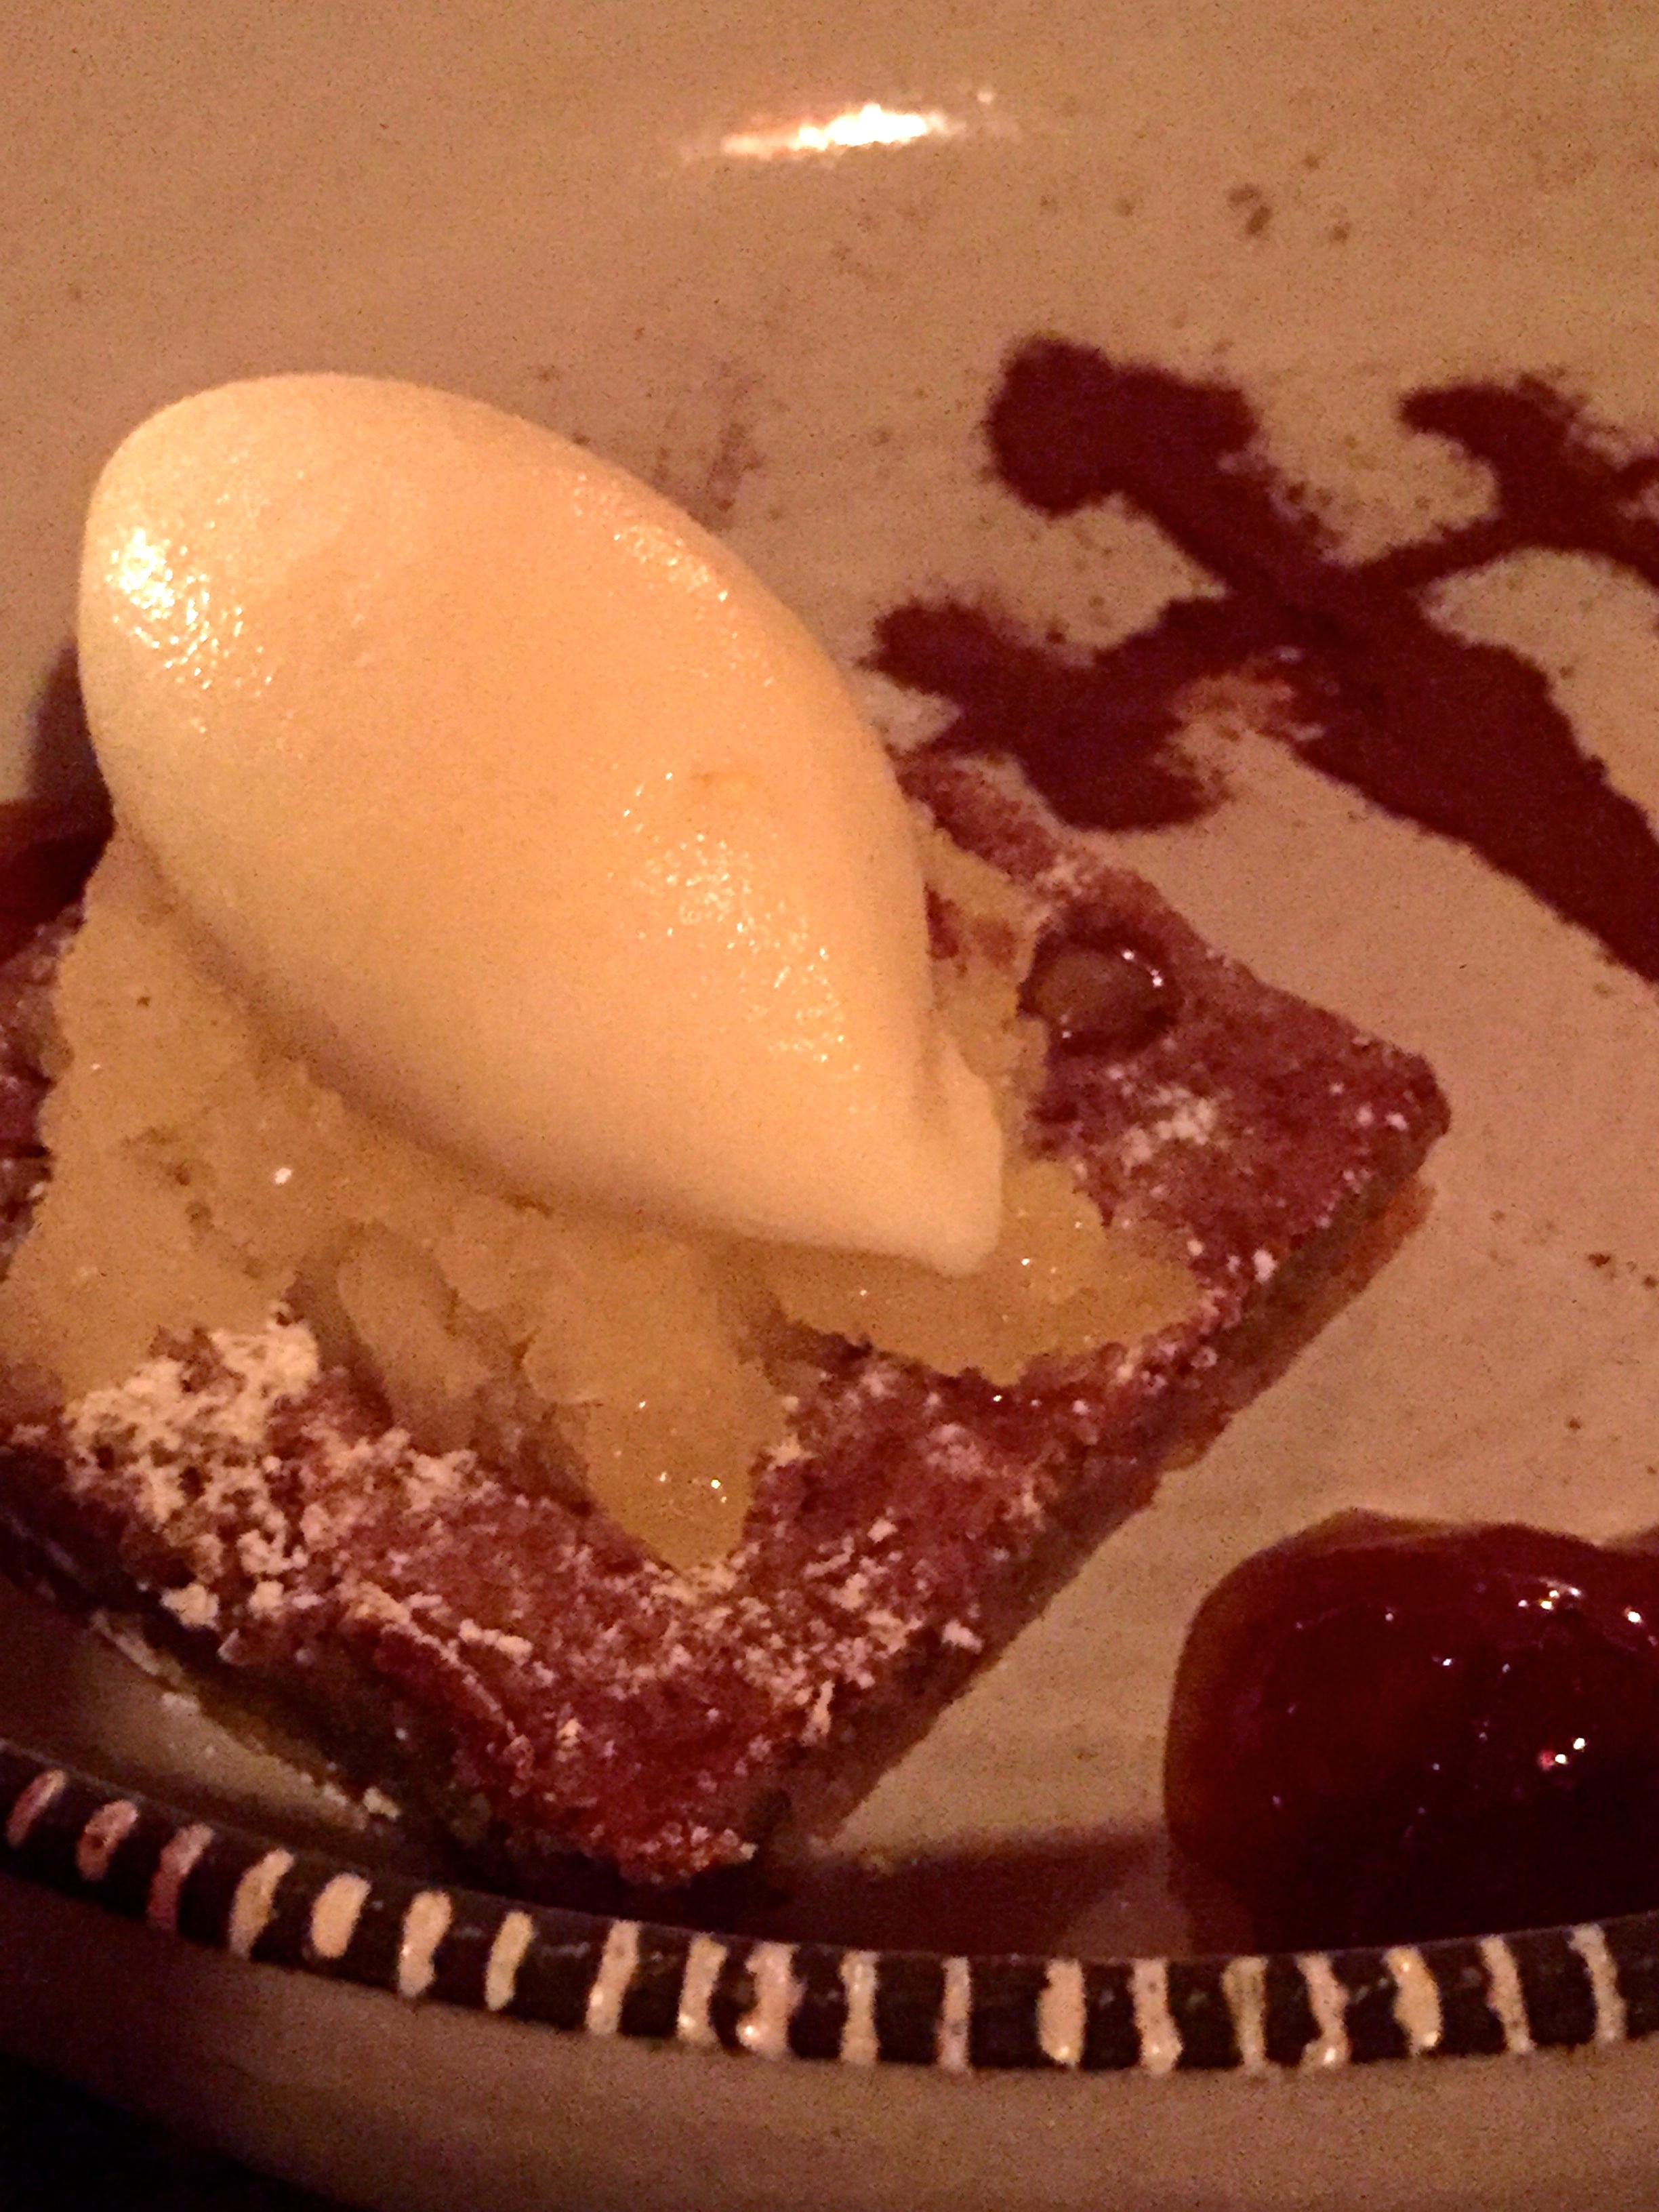 LA TARTA PERFECTA - marcona almond Santiago tart homage, lime granita, almond ice cream